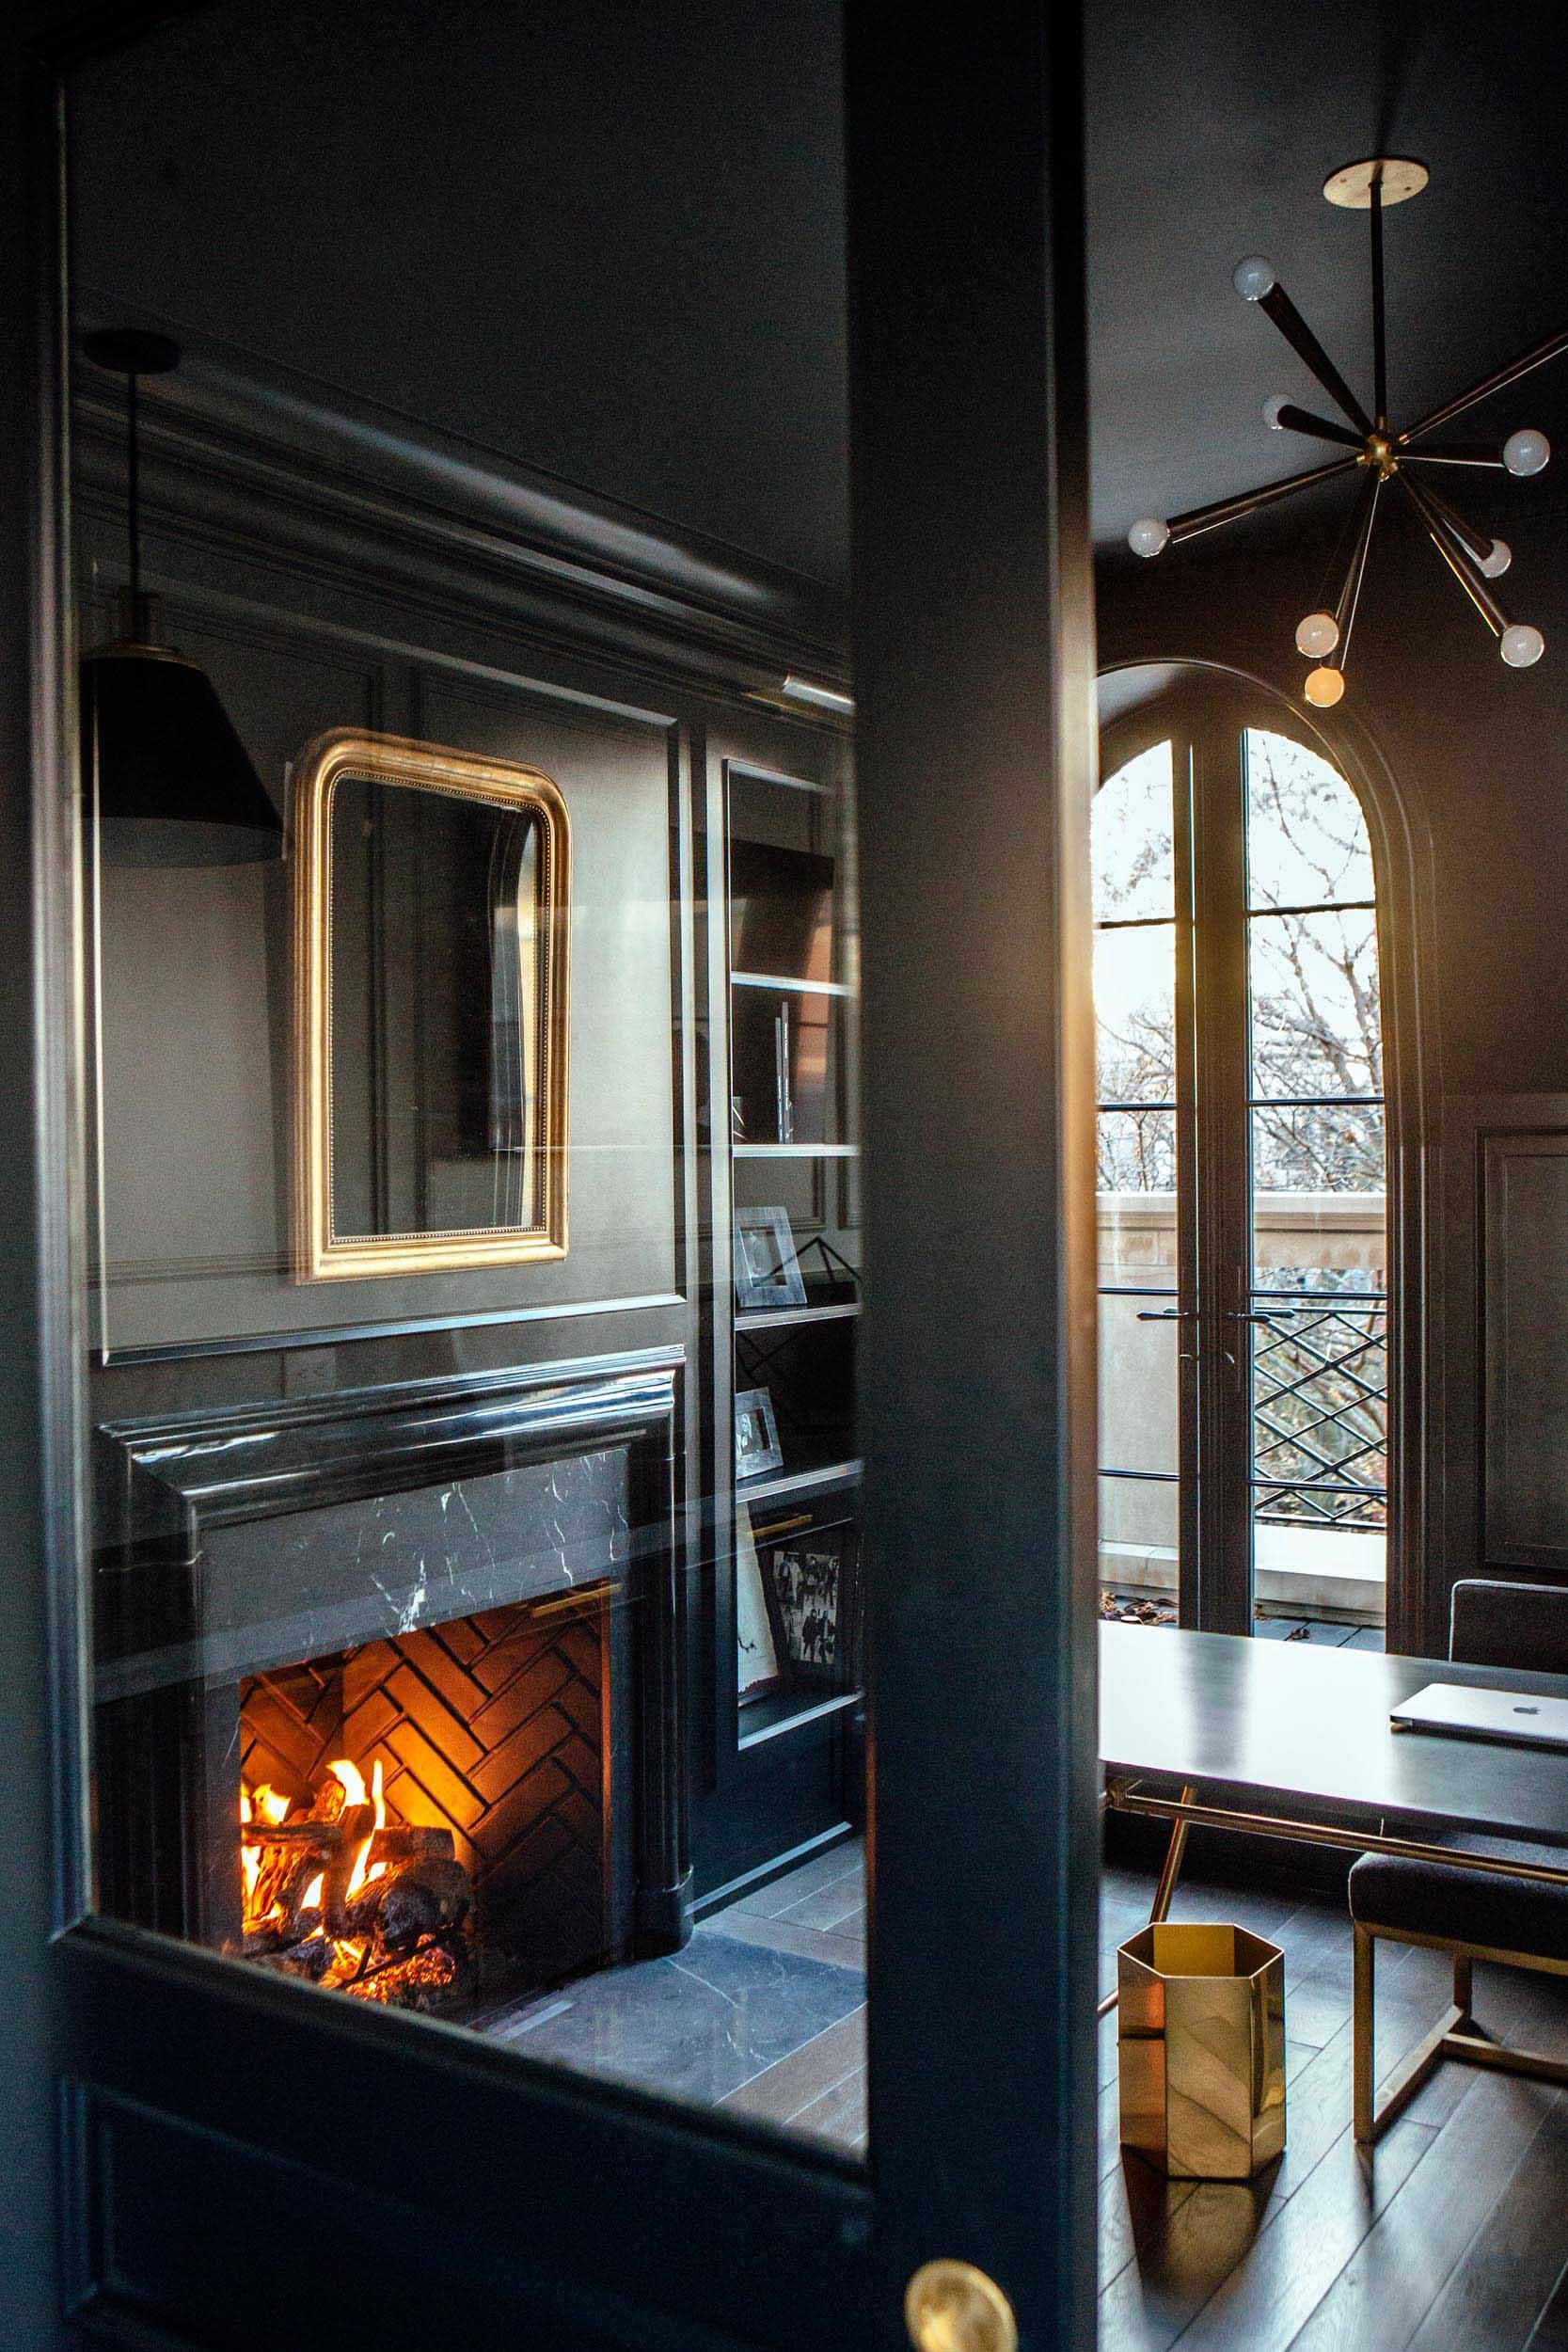 Leo_Designs_Chicago_interior_design_lincoln_park_parisian14.jpg